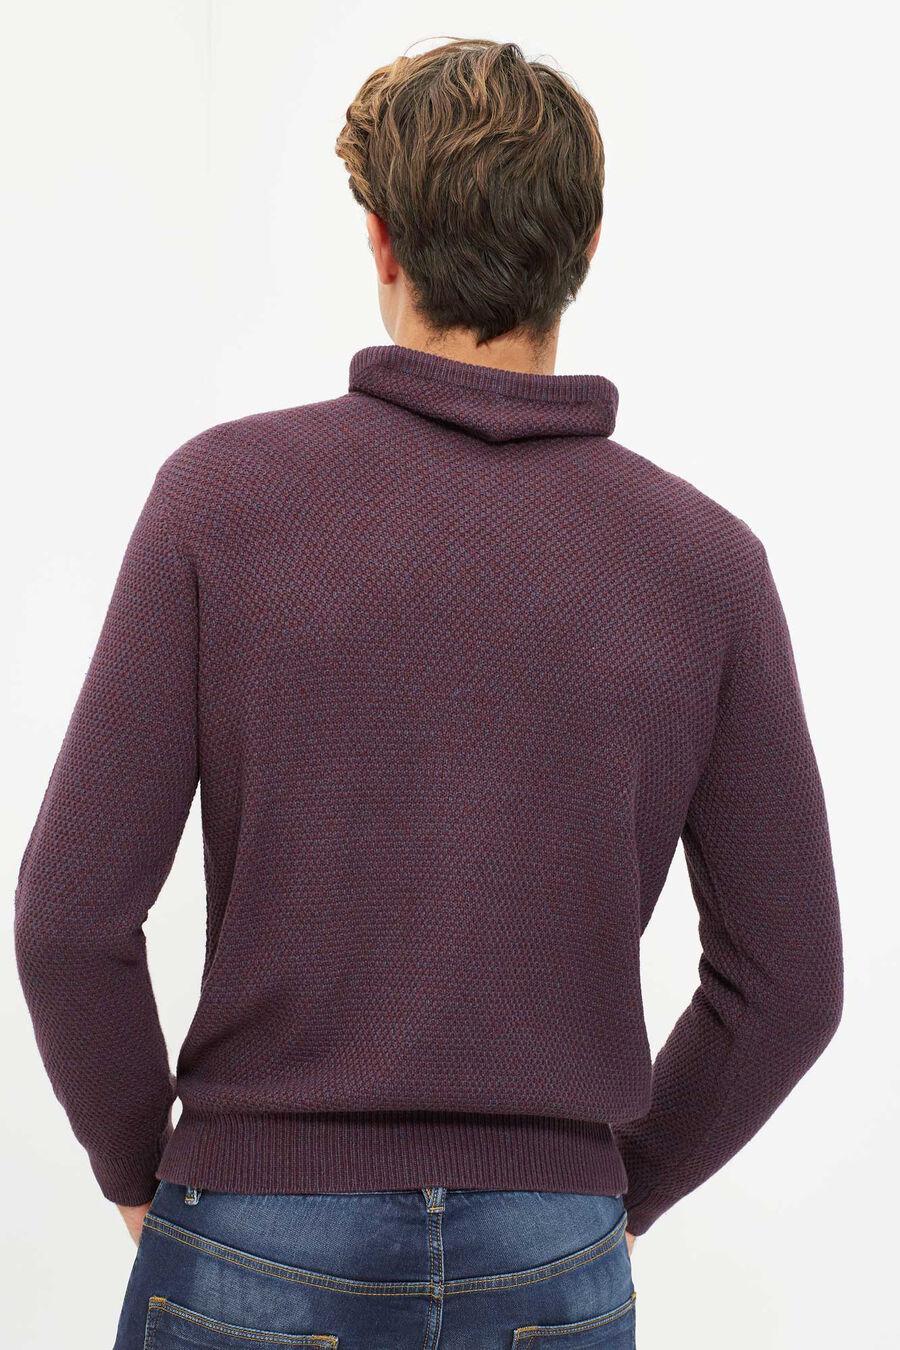 Tuxedo neck sweater